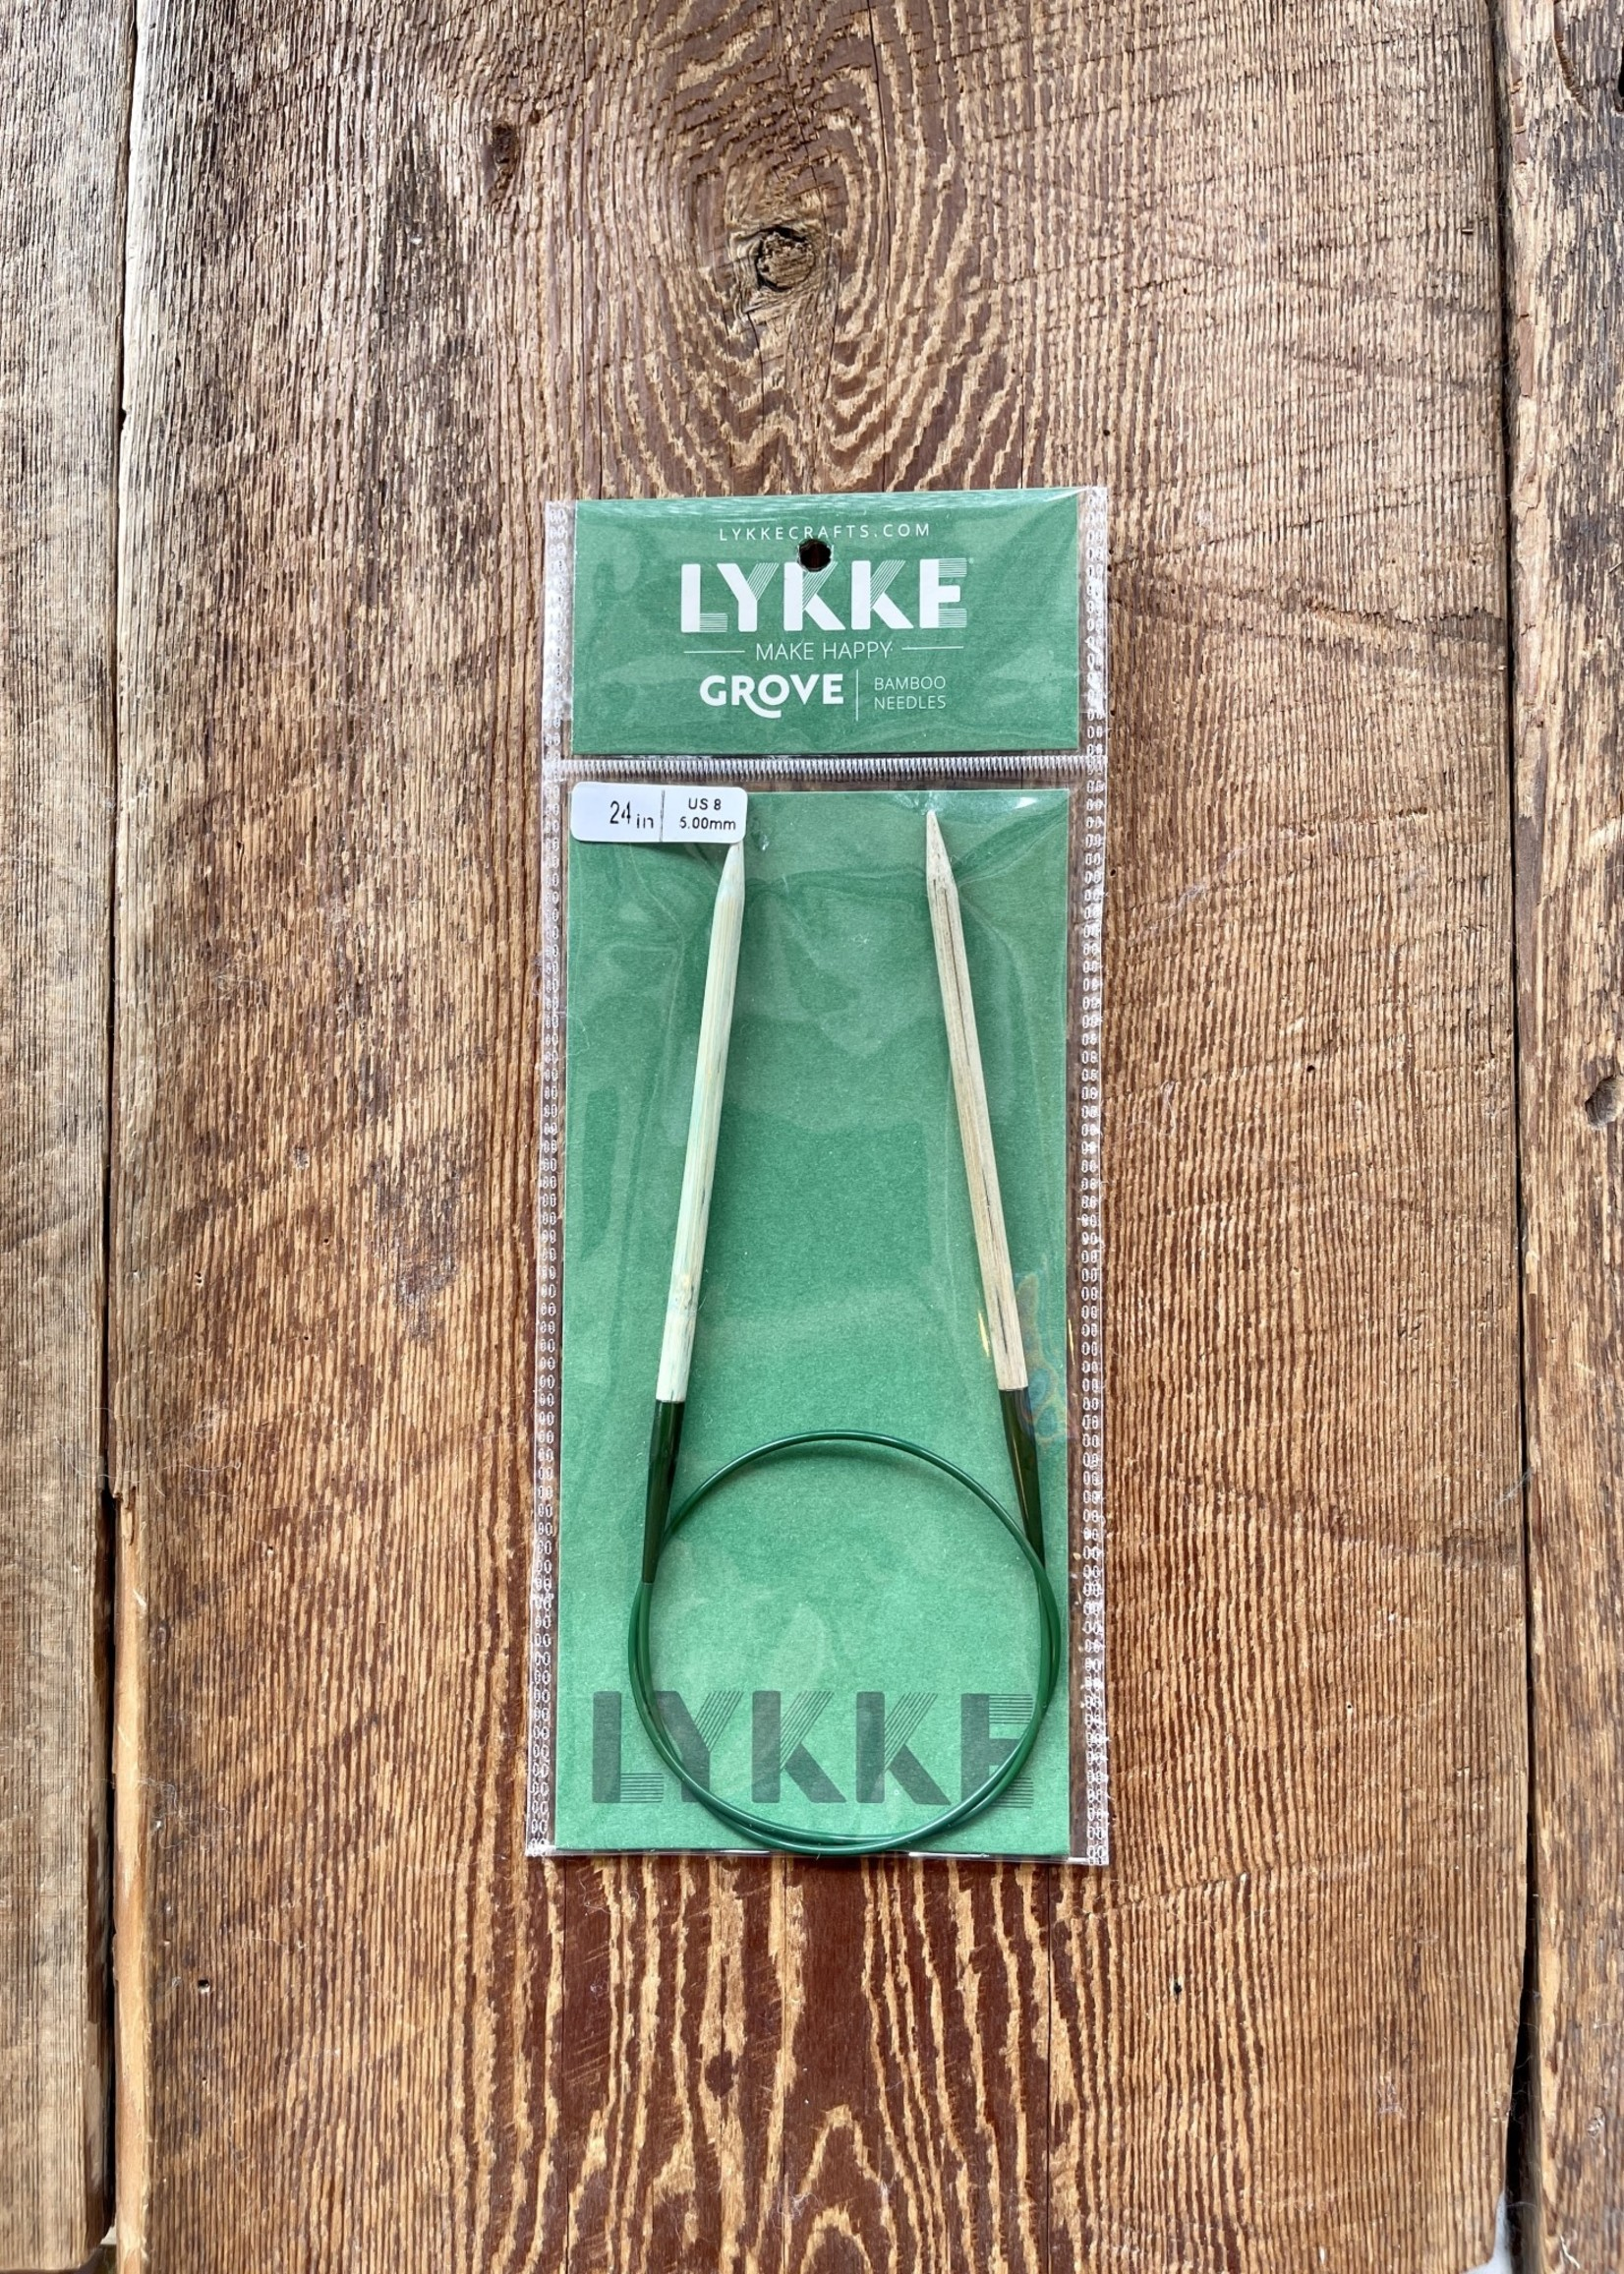 Lykke LYKKE-Grove FC